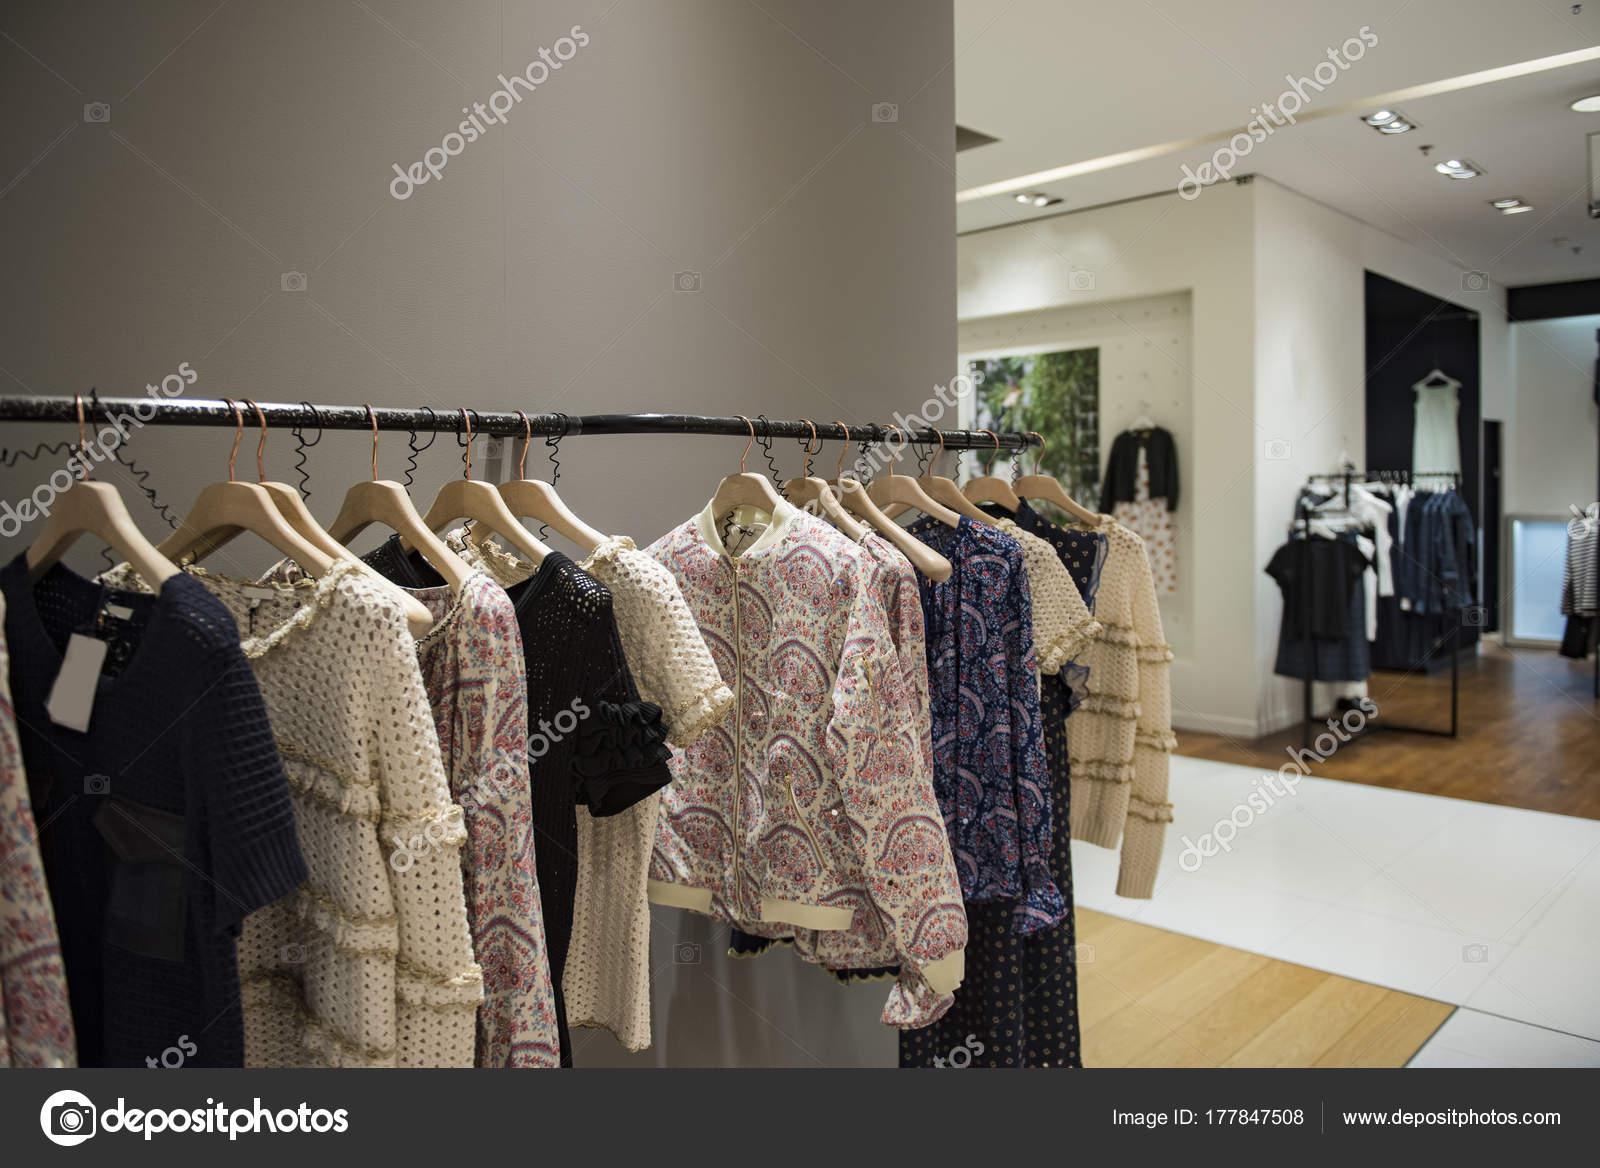 ed5a4a3c6988 Donne eleganti vestiti in un negozio di lusso a Parigi — Foto di ...